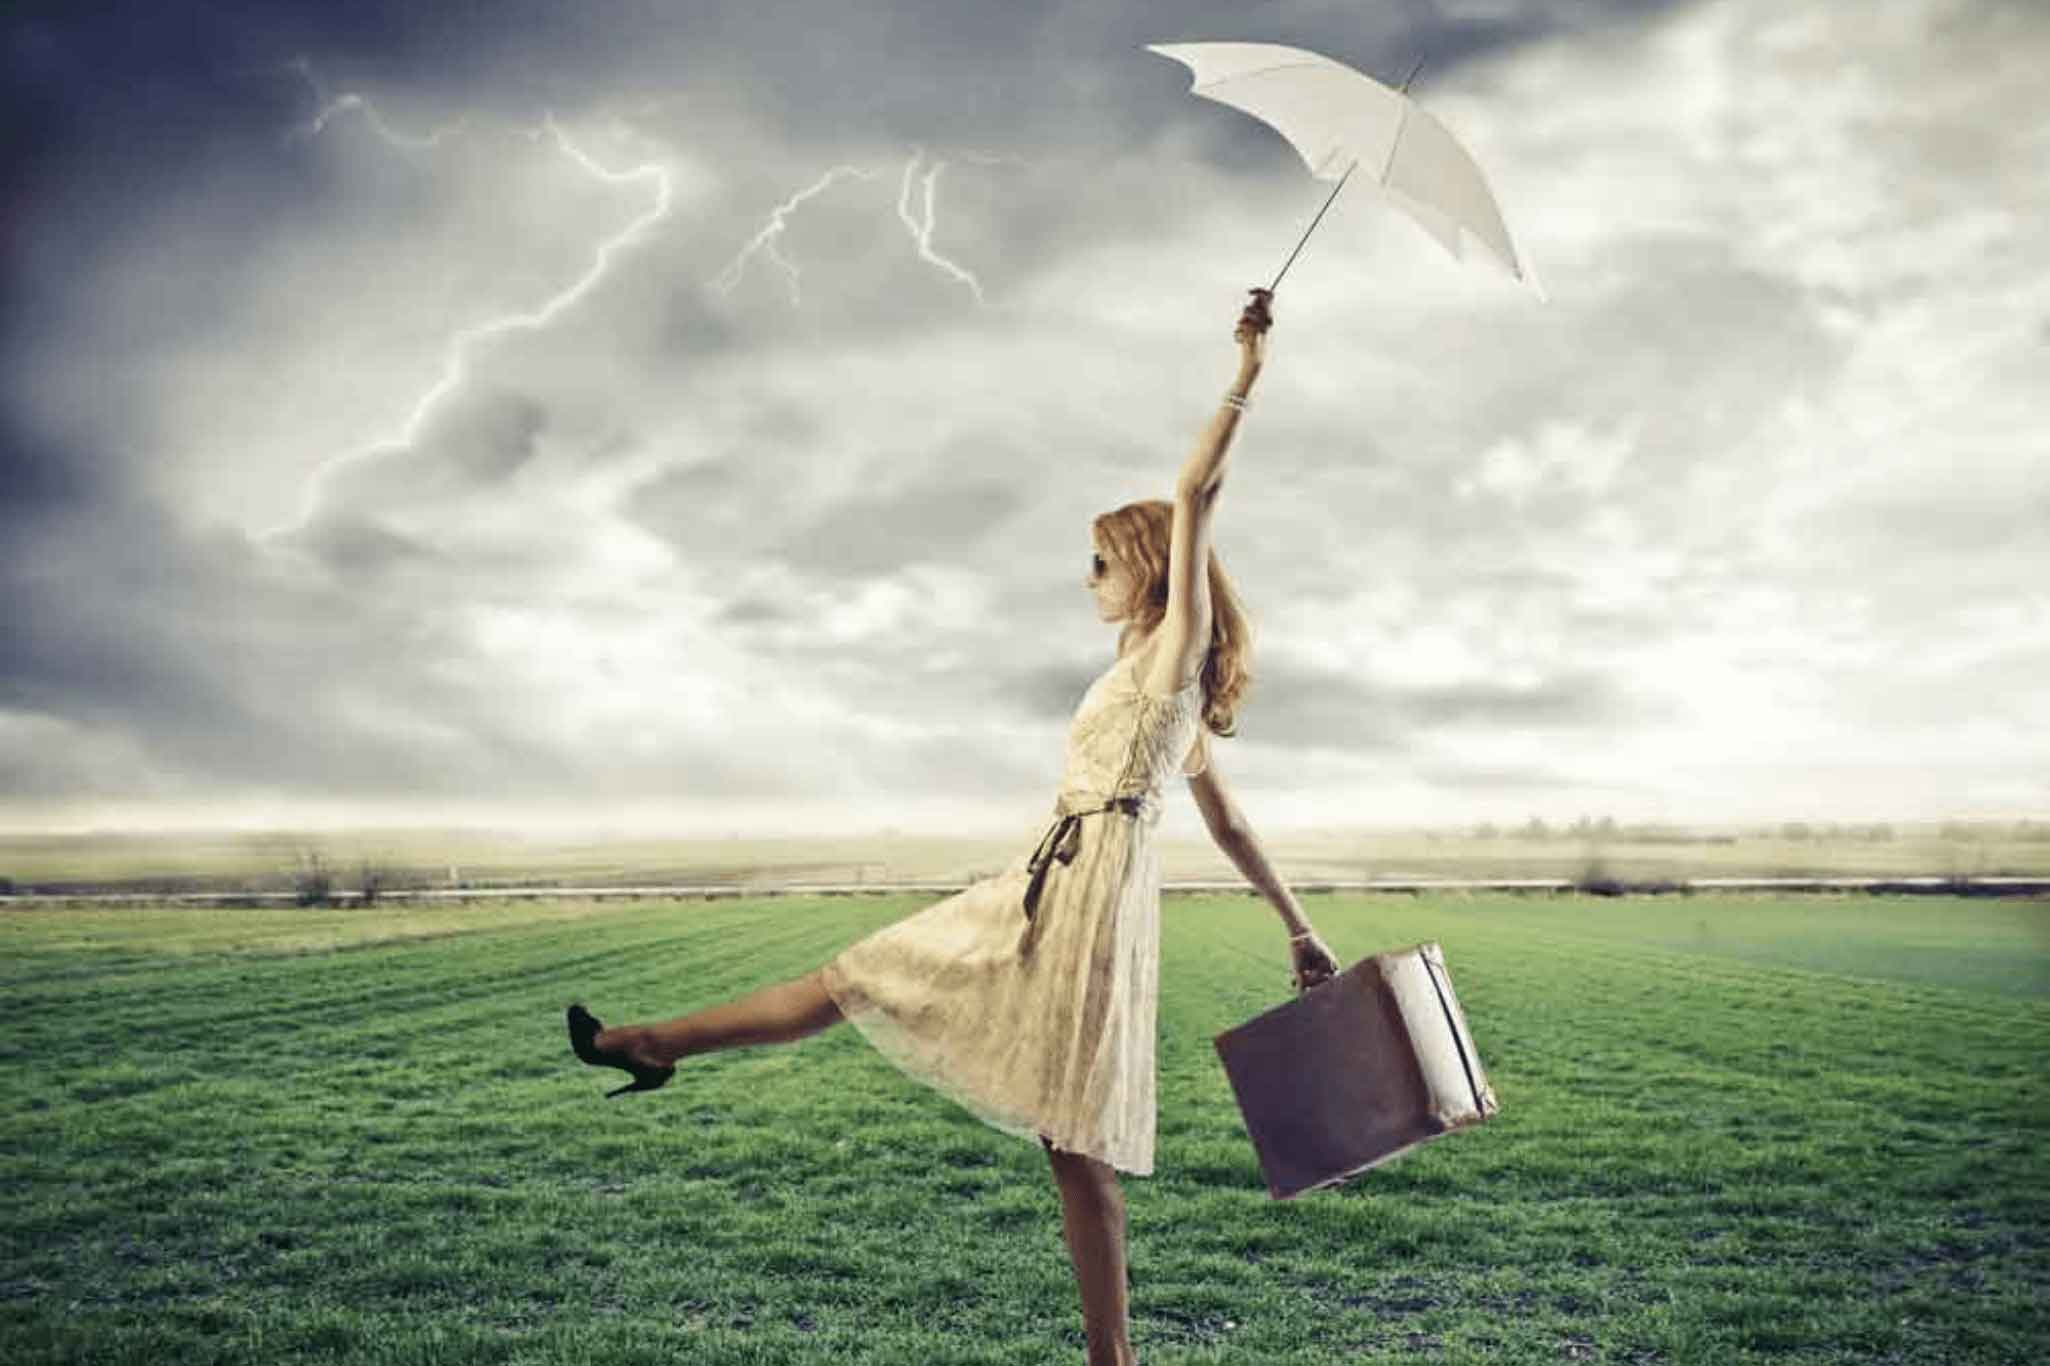 The Umbrella of Faith